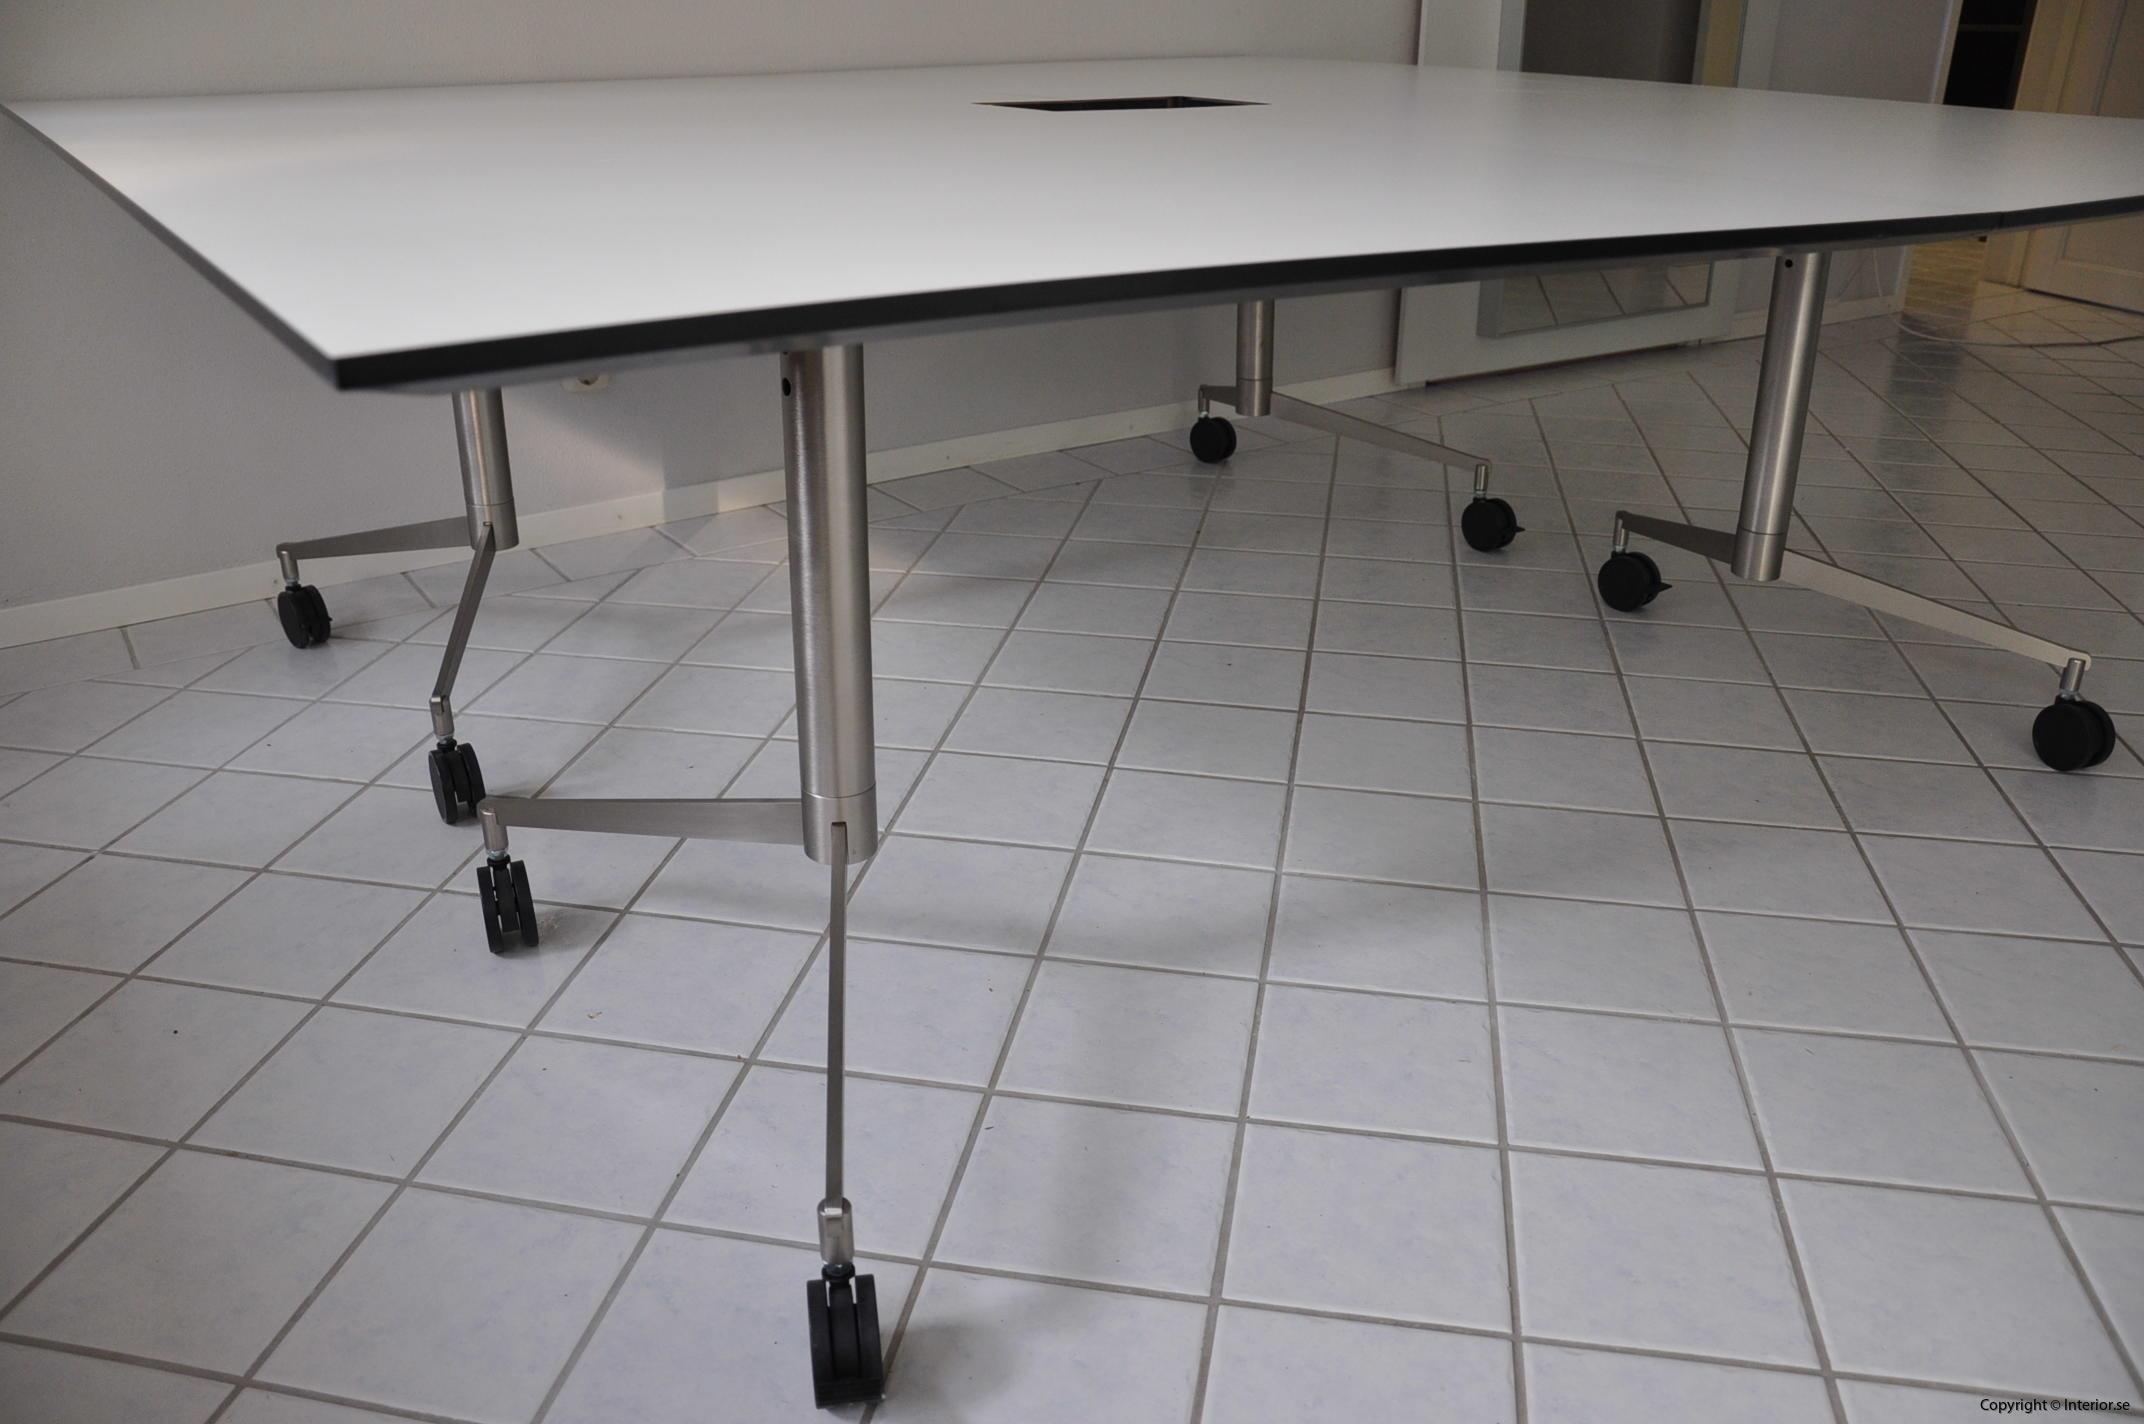 konferensbord begagnat laminat stockholm paustian furniture denmark (6)